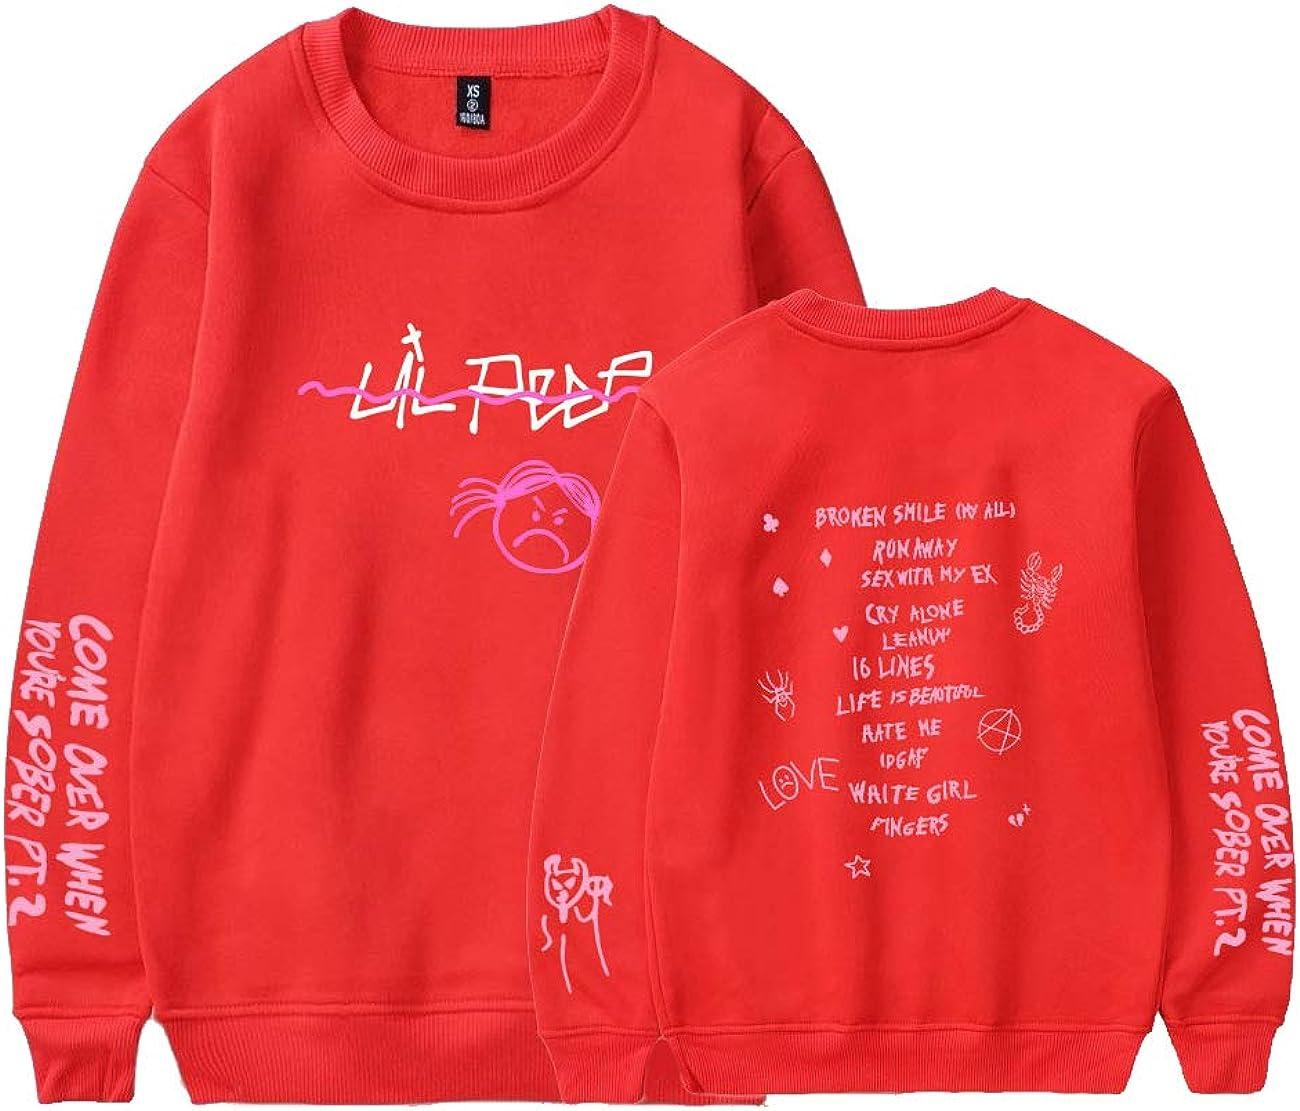 Sweatshirt Adolescent Garcon Fille Col Rond Manches Longues Sweat Rap Hip Hop Hellboy Impression Top Blouse Casual Sport Atuomne Hiver Pull Lil Peep pour Homme Femme